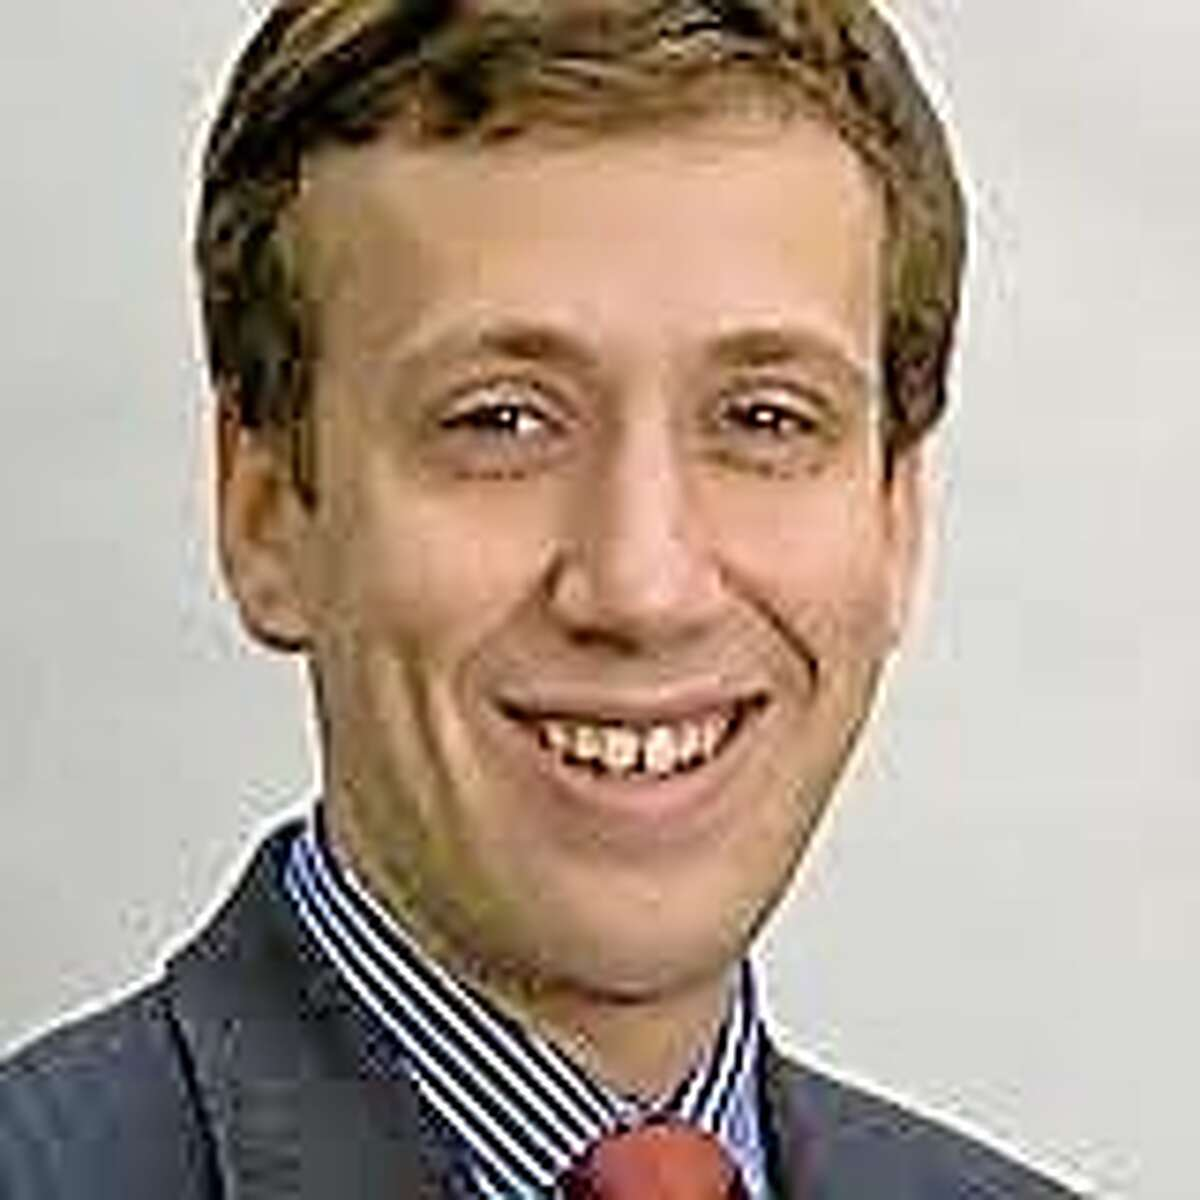 State Rep. Matthew Lesser